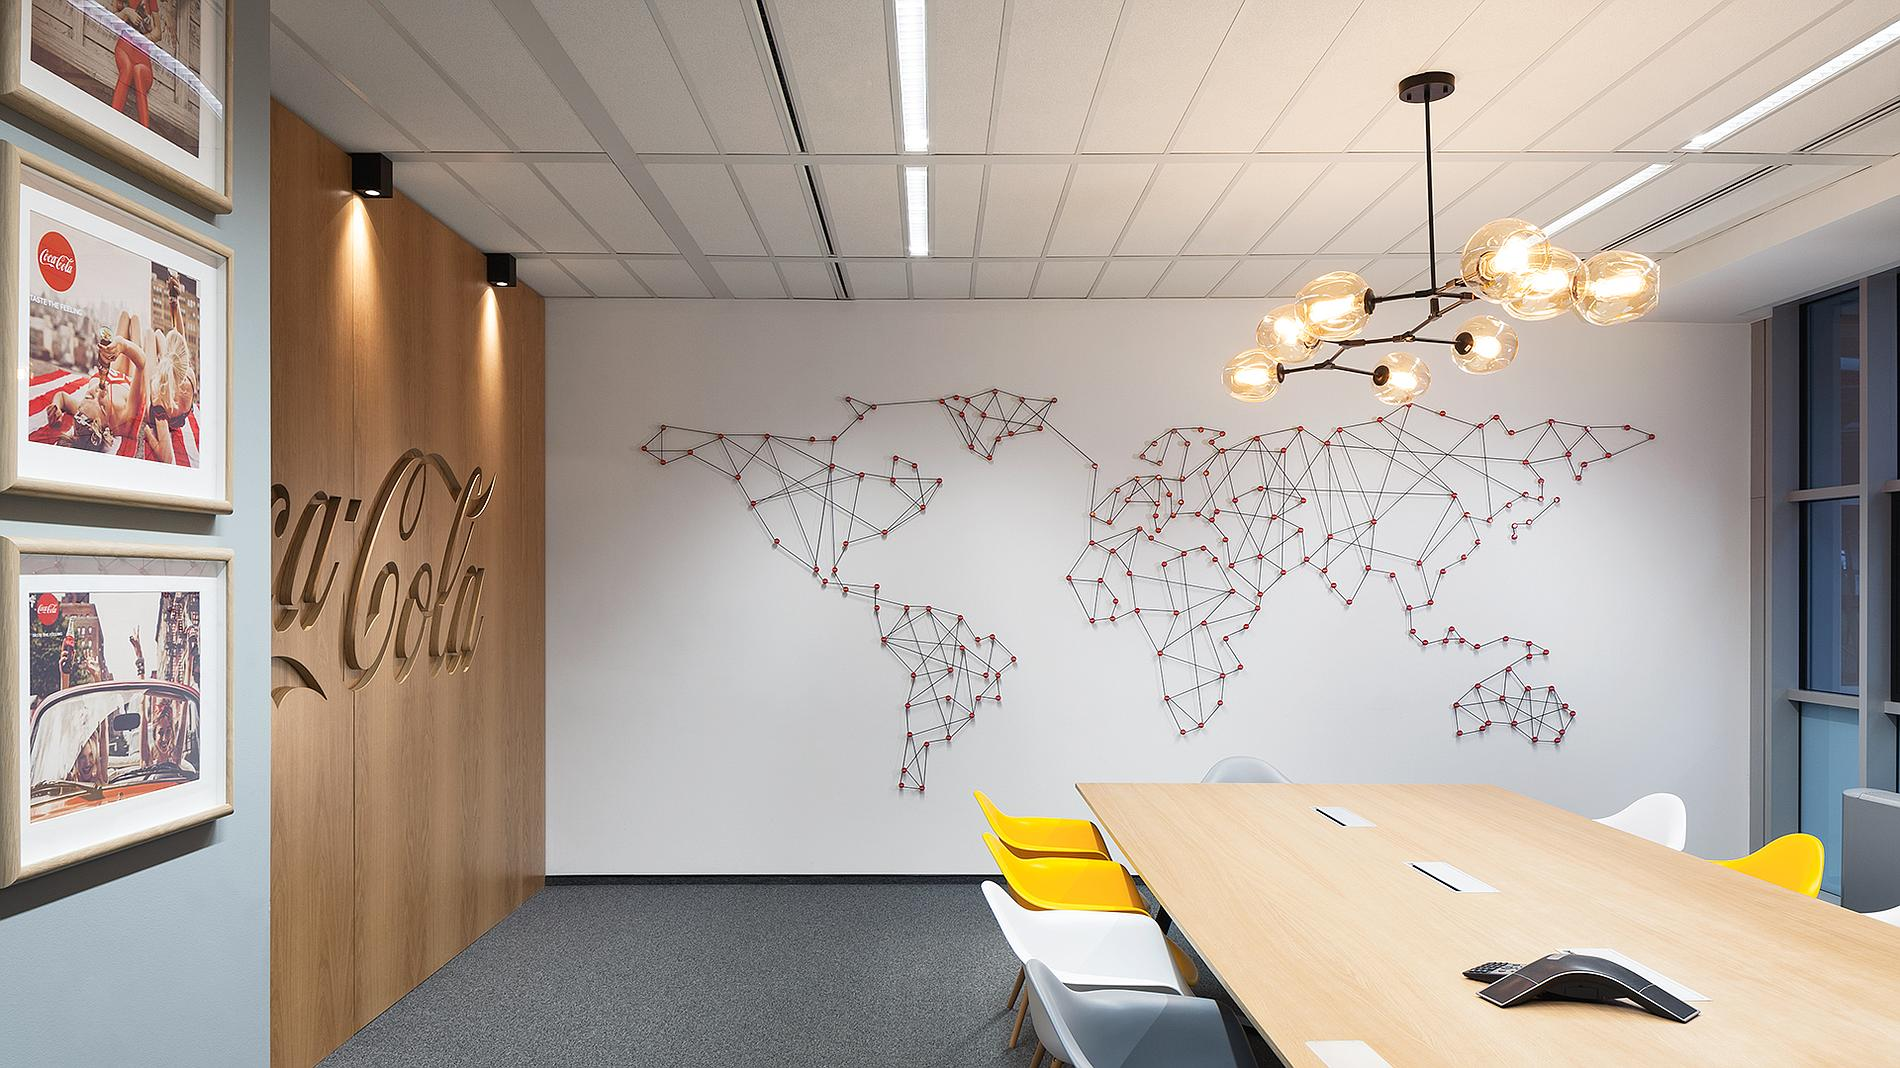 Coca-Cola interior design and branding, wood wall